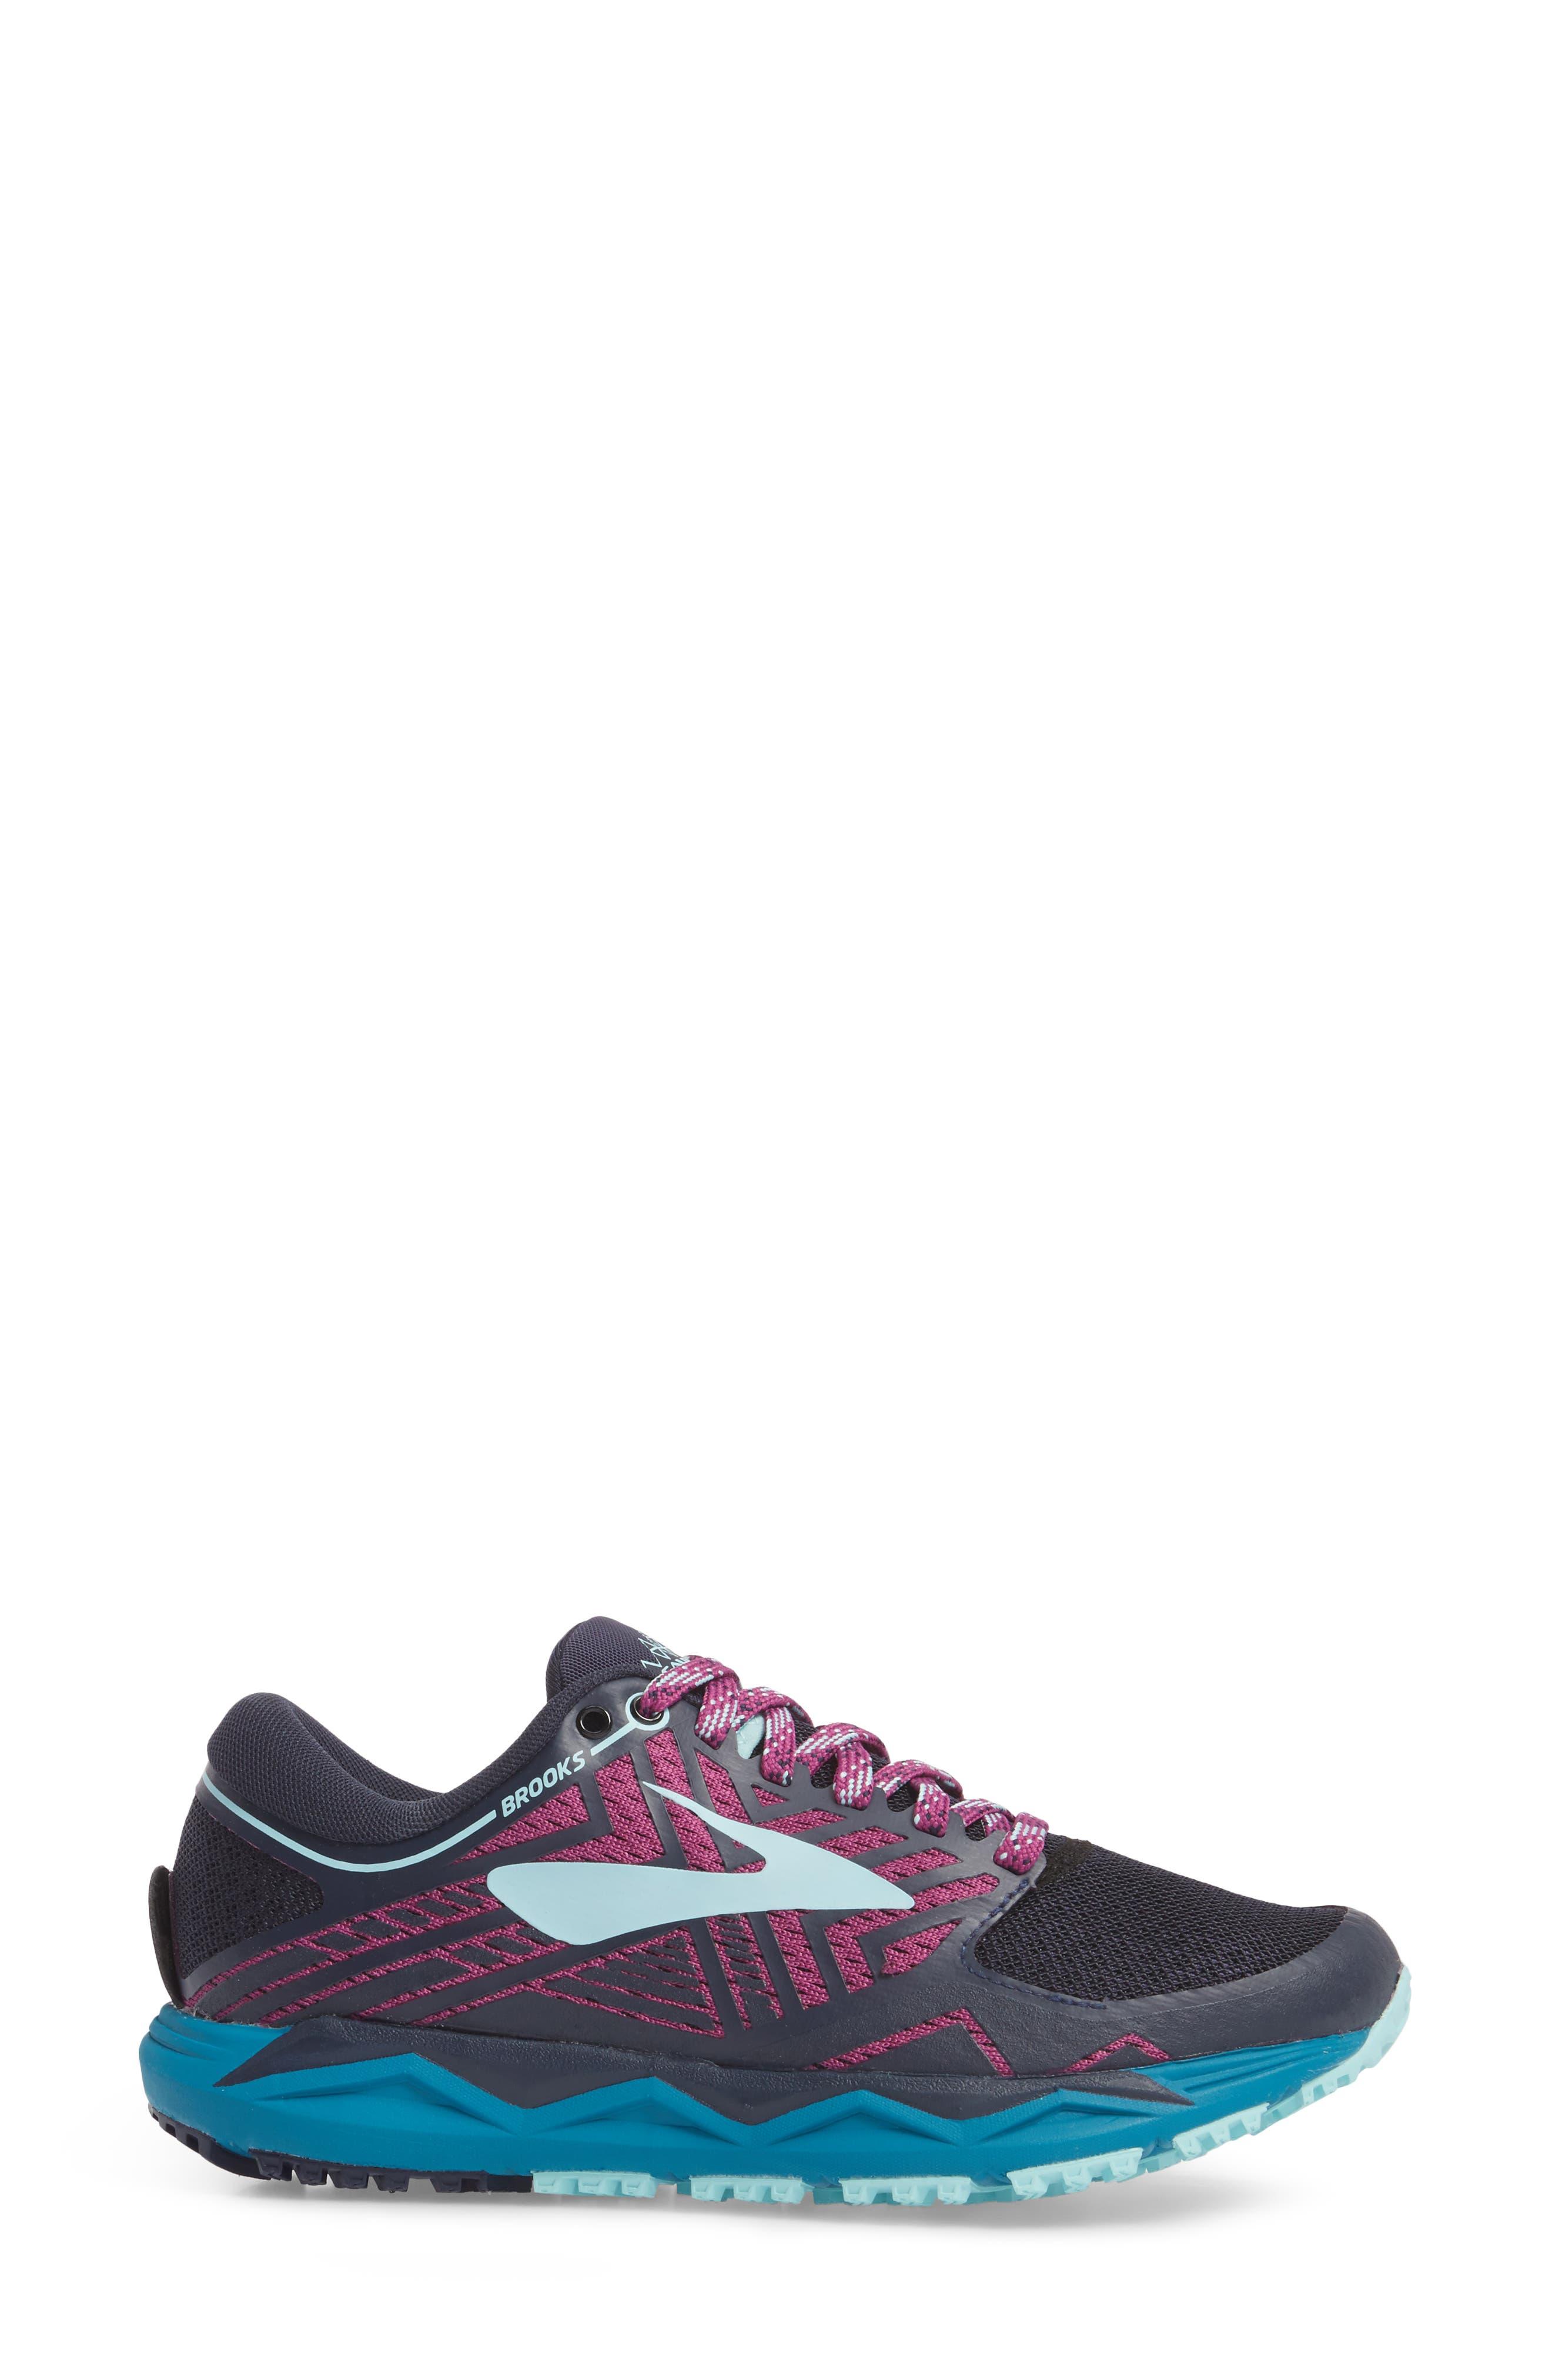 Alternate Image 3  - Brooks Caldera 2 Trail Running Shoe (Women)